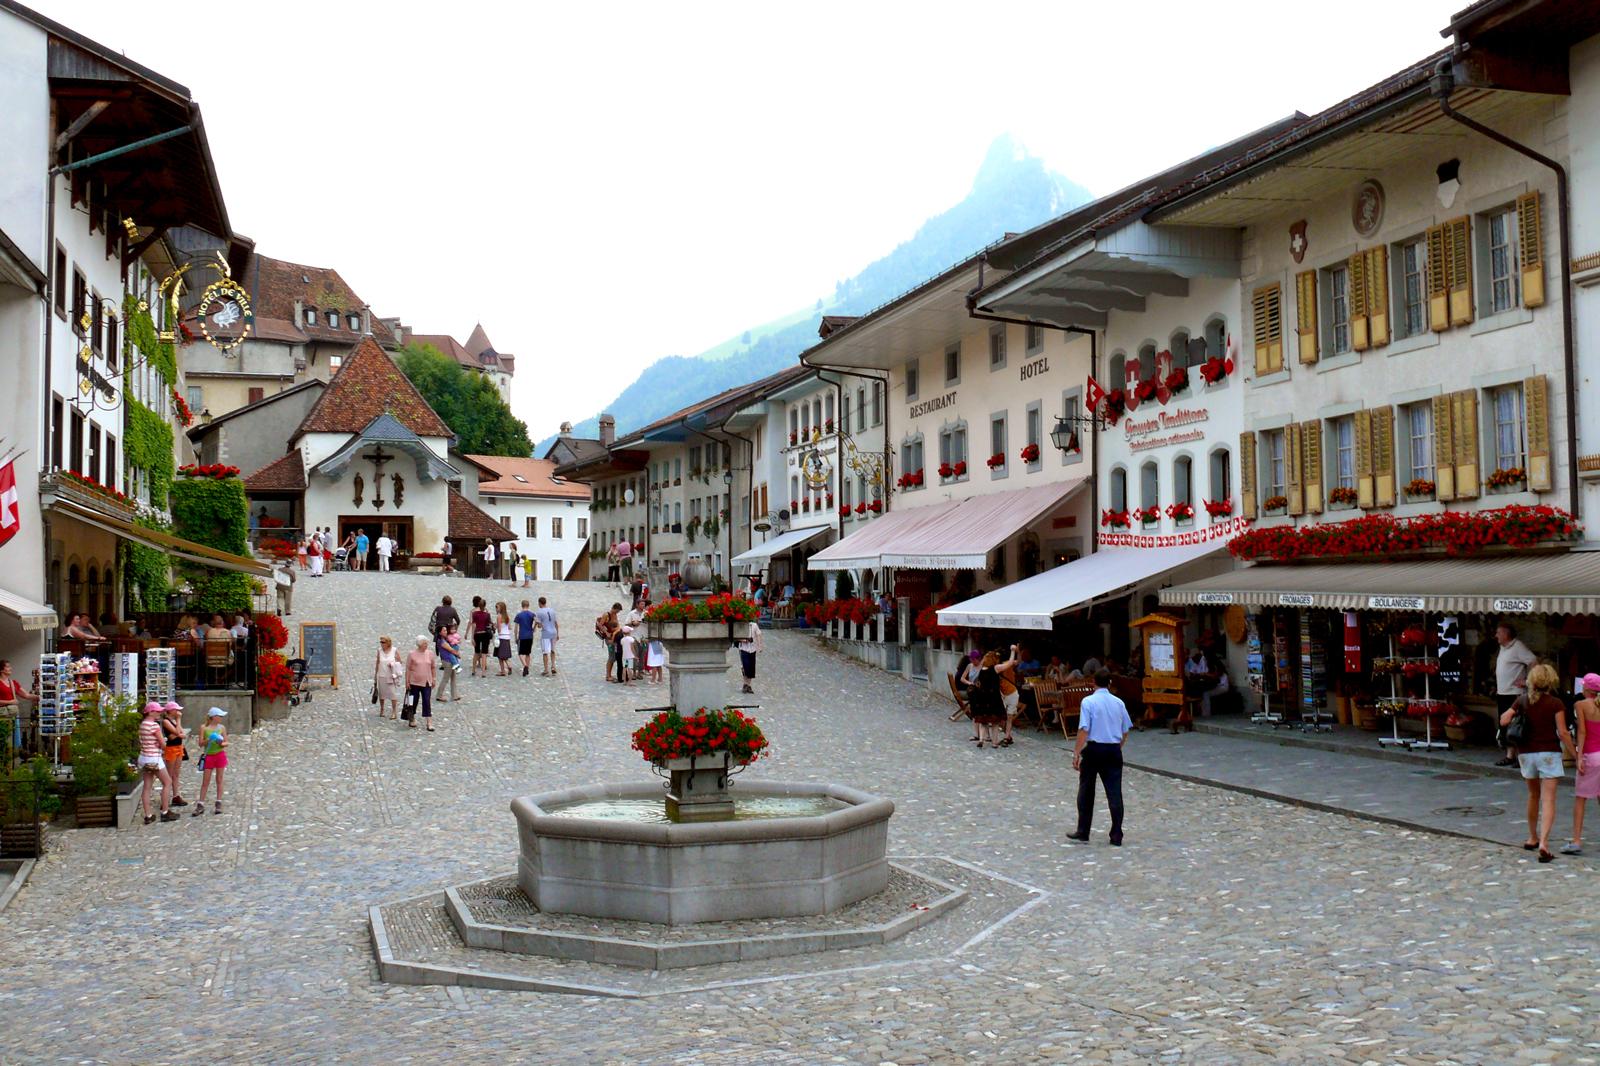 Main square, Gruyere (CH / FR)